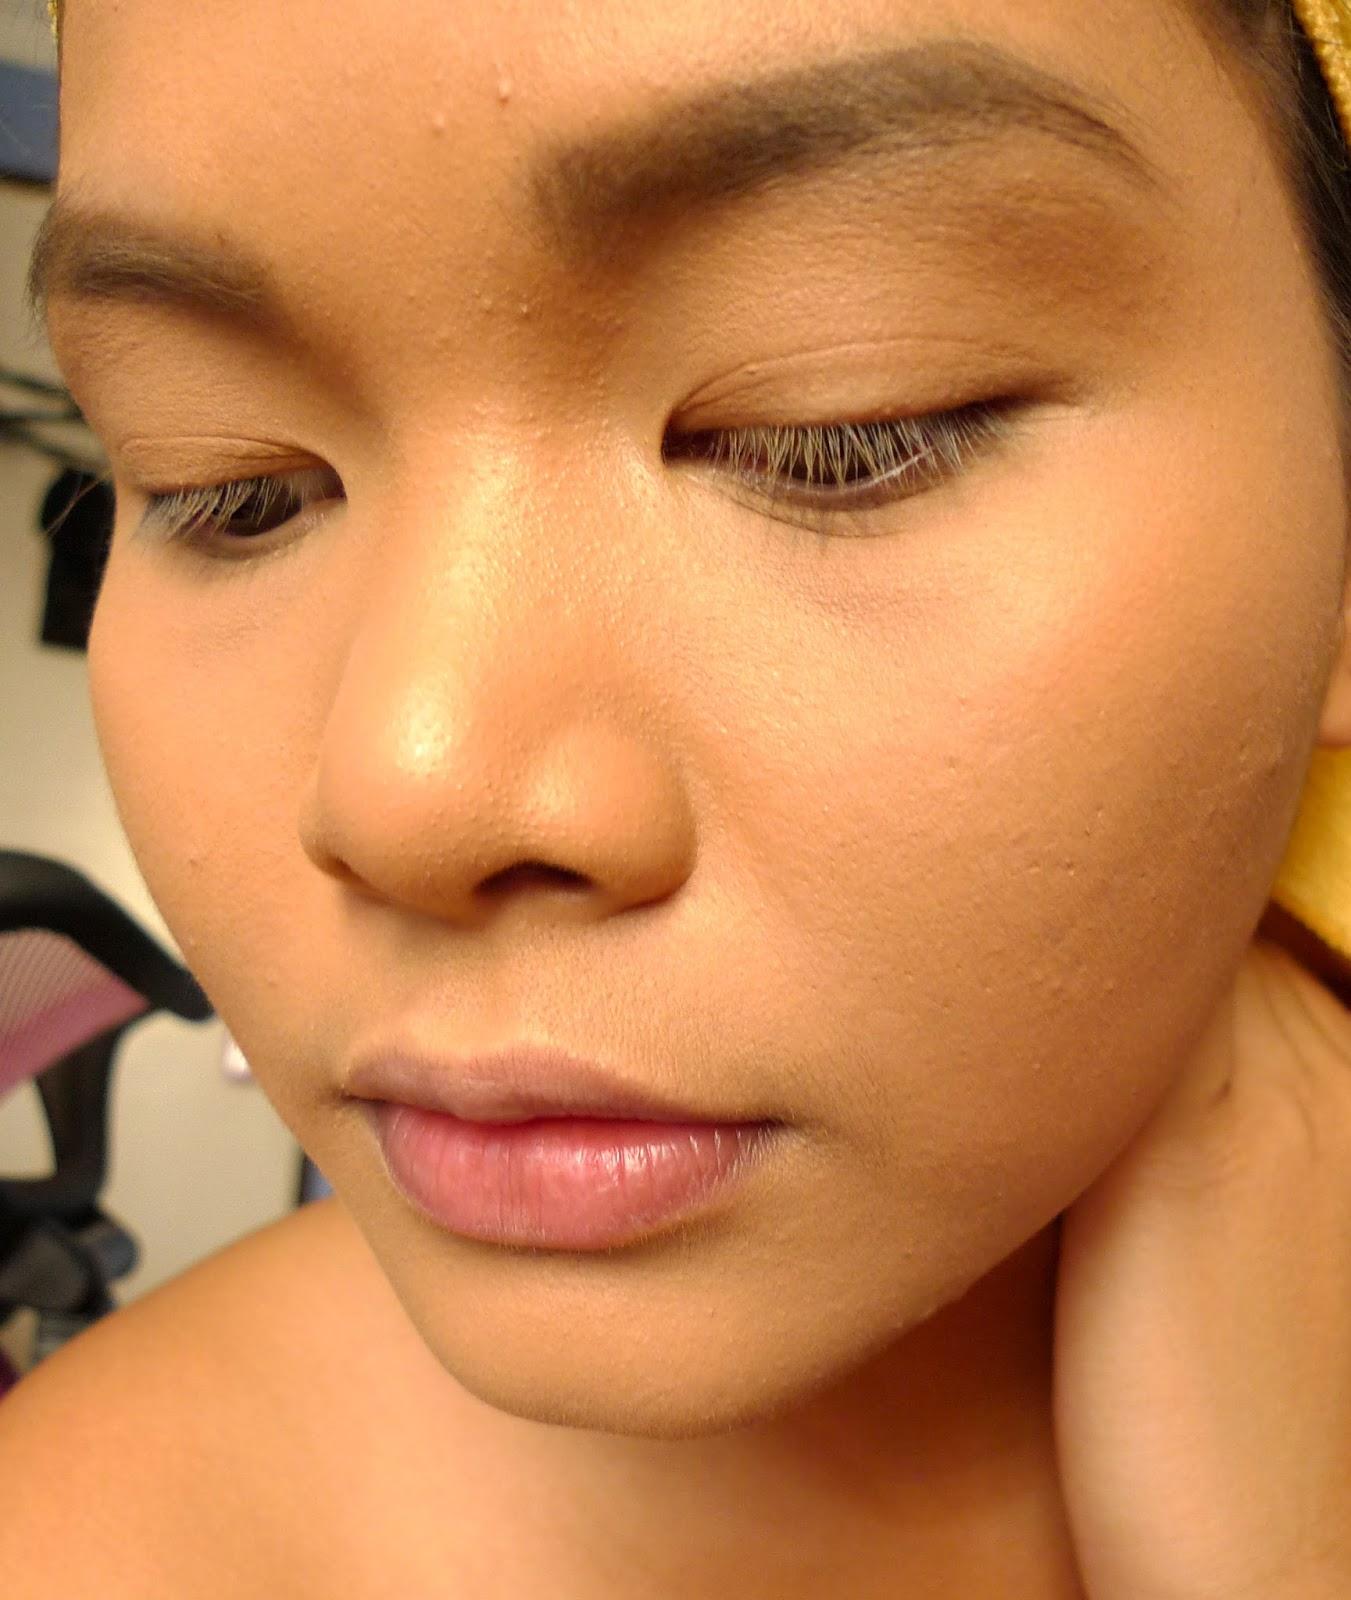 Cakey makeup dry skin